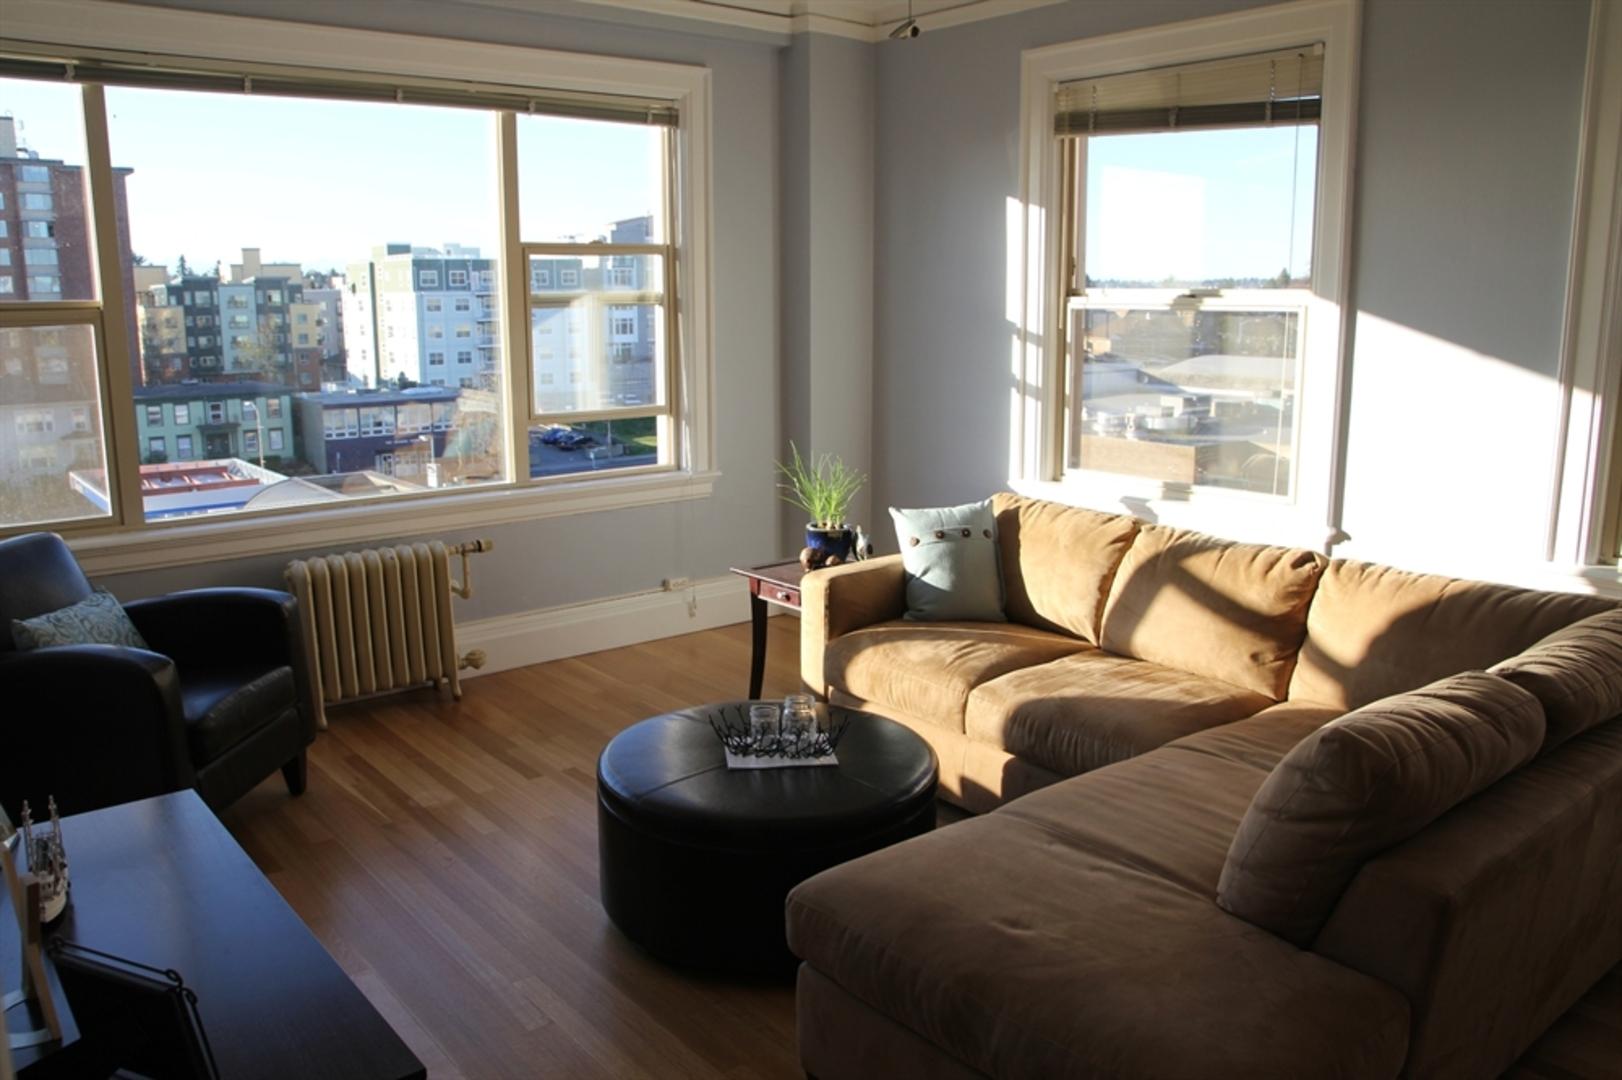 Lothlorien Apartments Photo Gallery | Seattle, WA ...